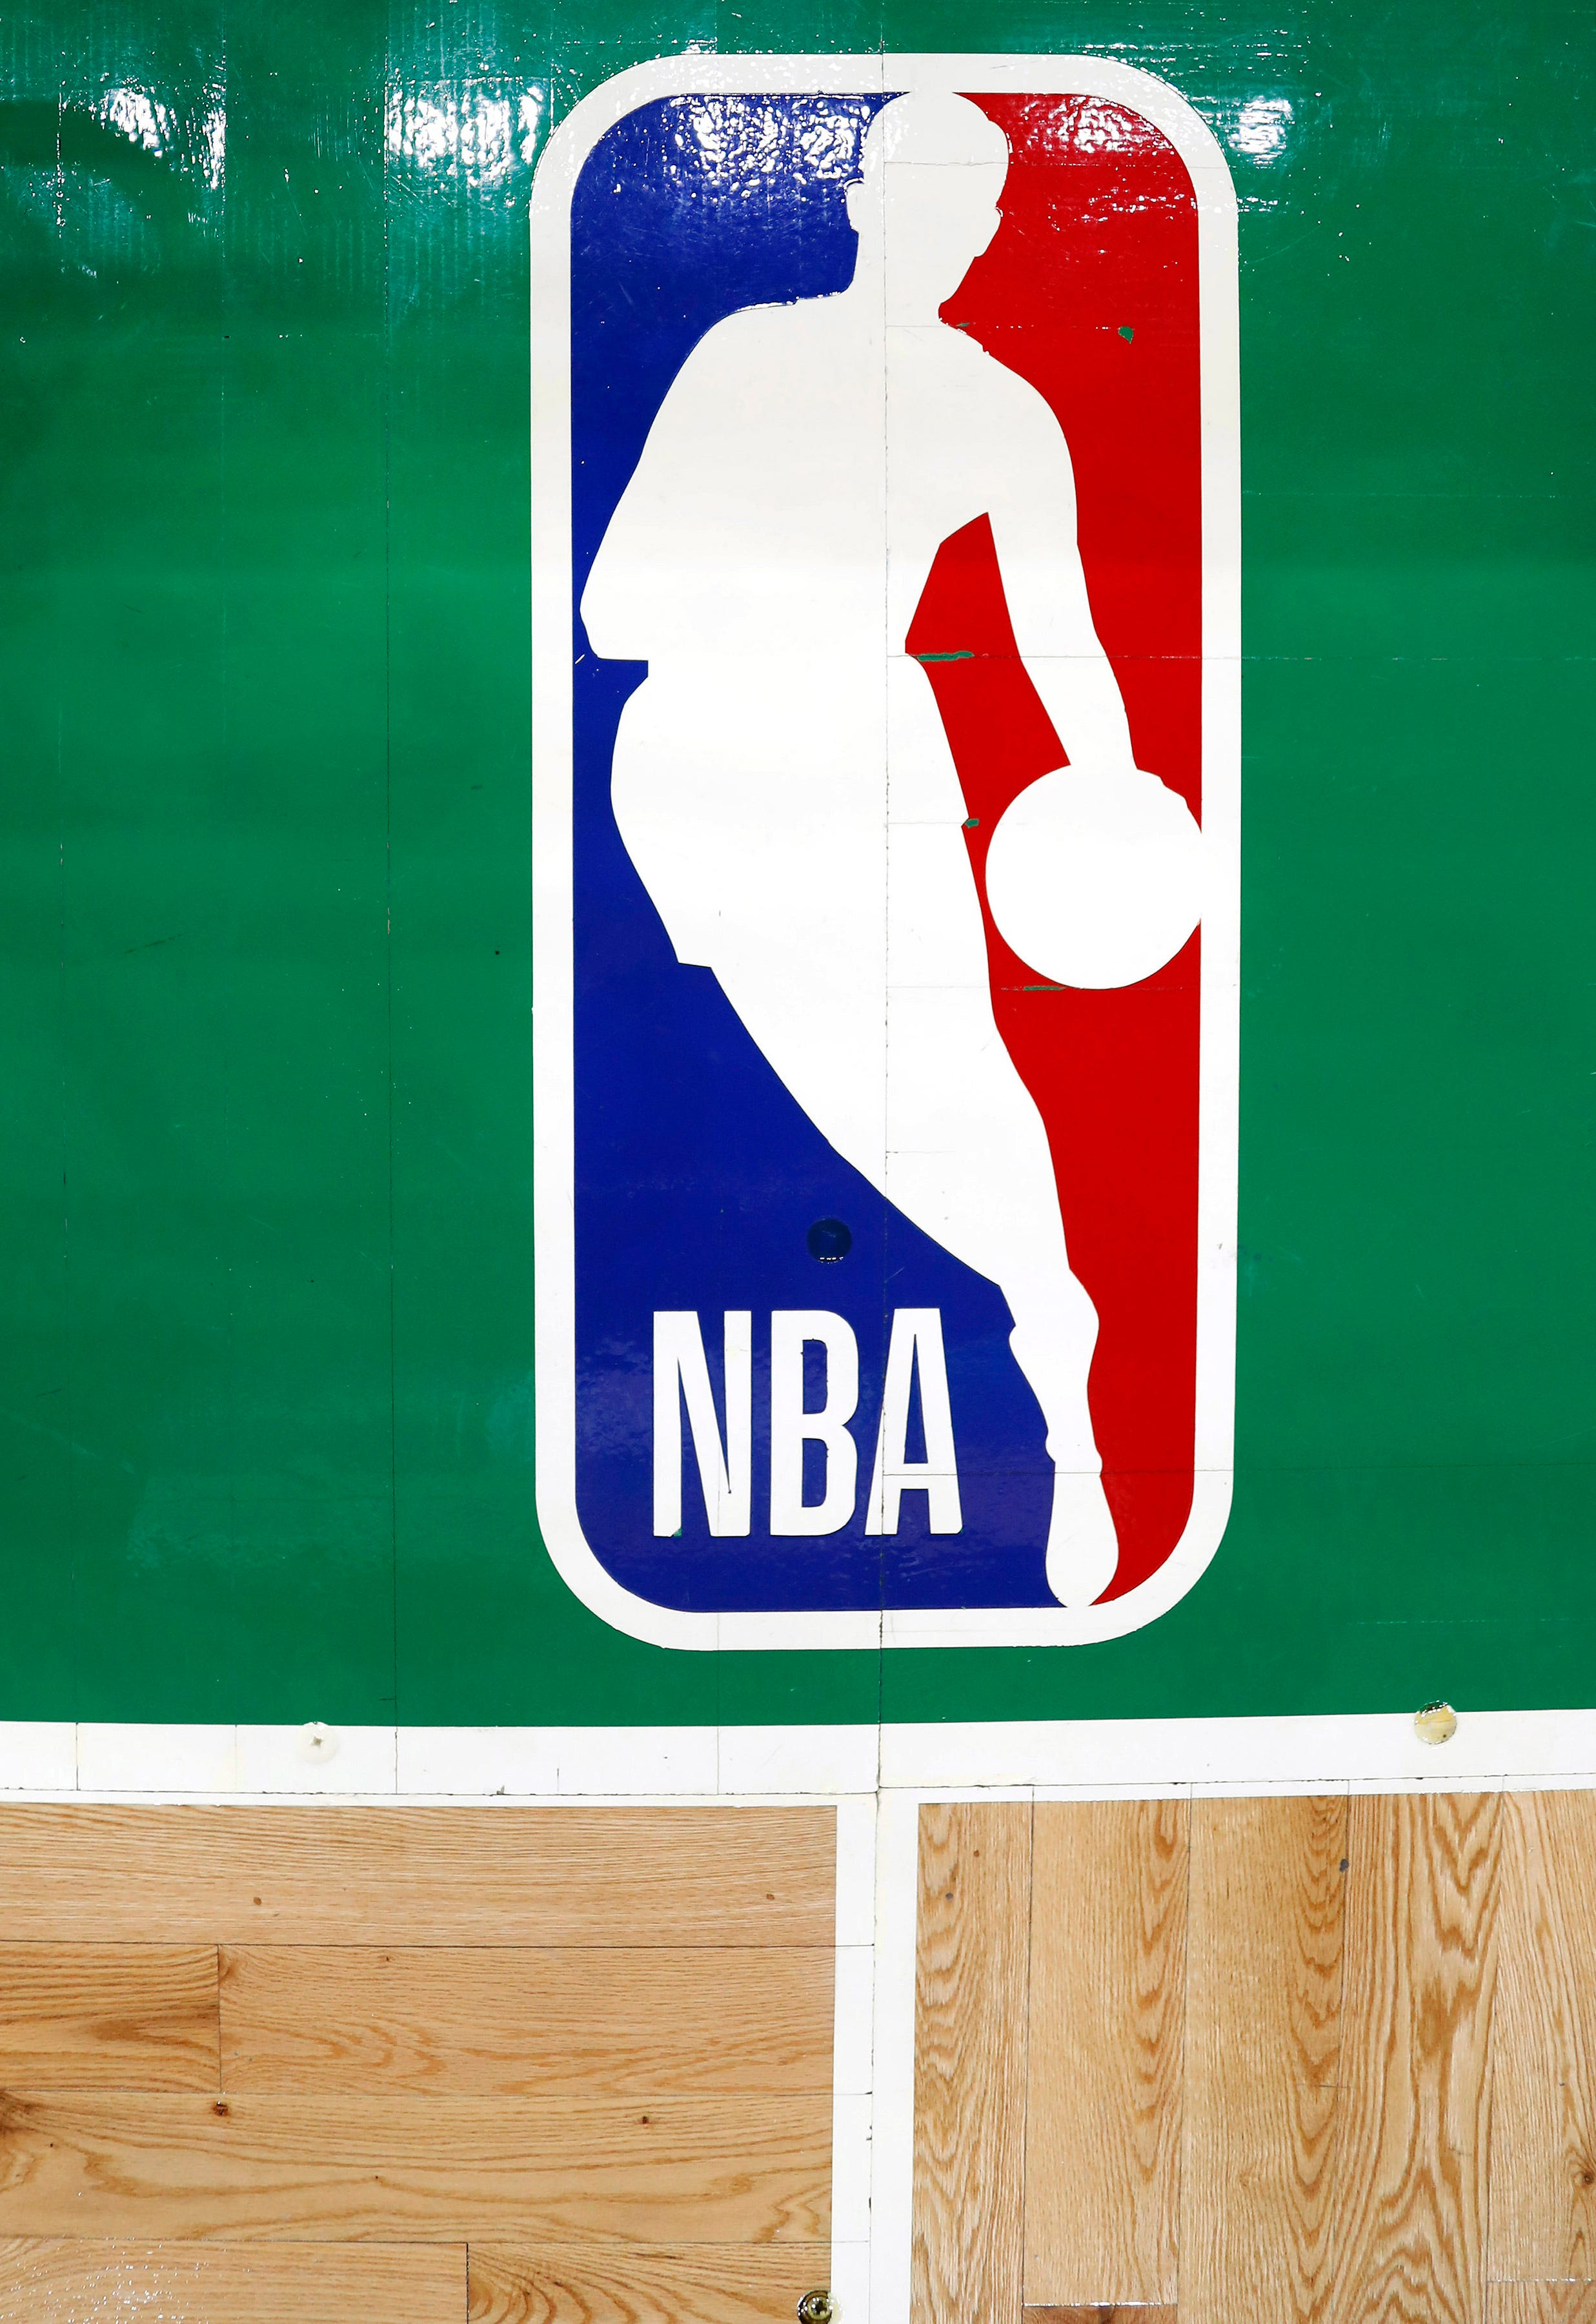 NBA outlines extensive coronavirus health and safety protocols for 2020-21 season